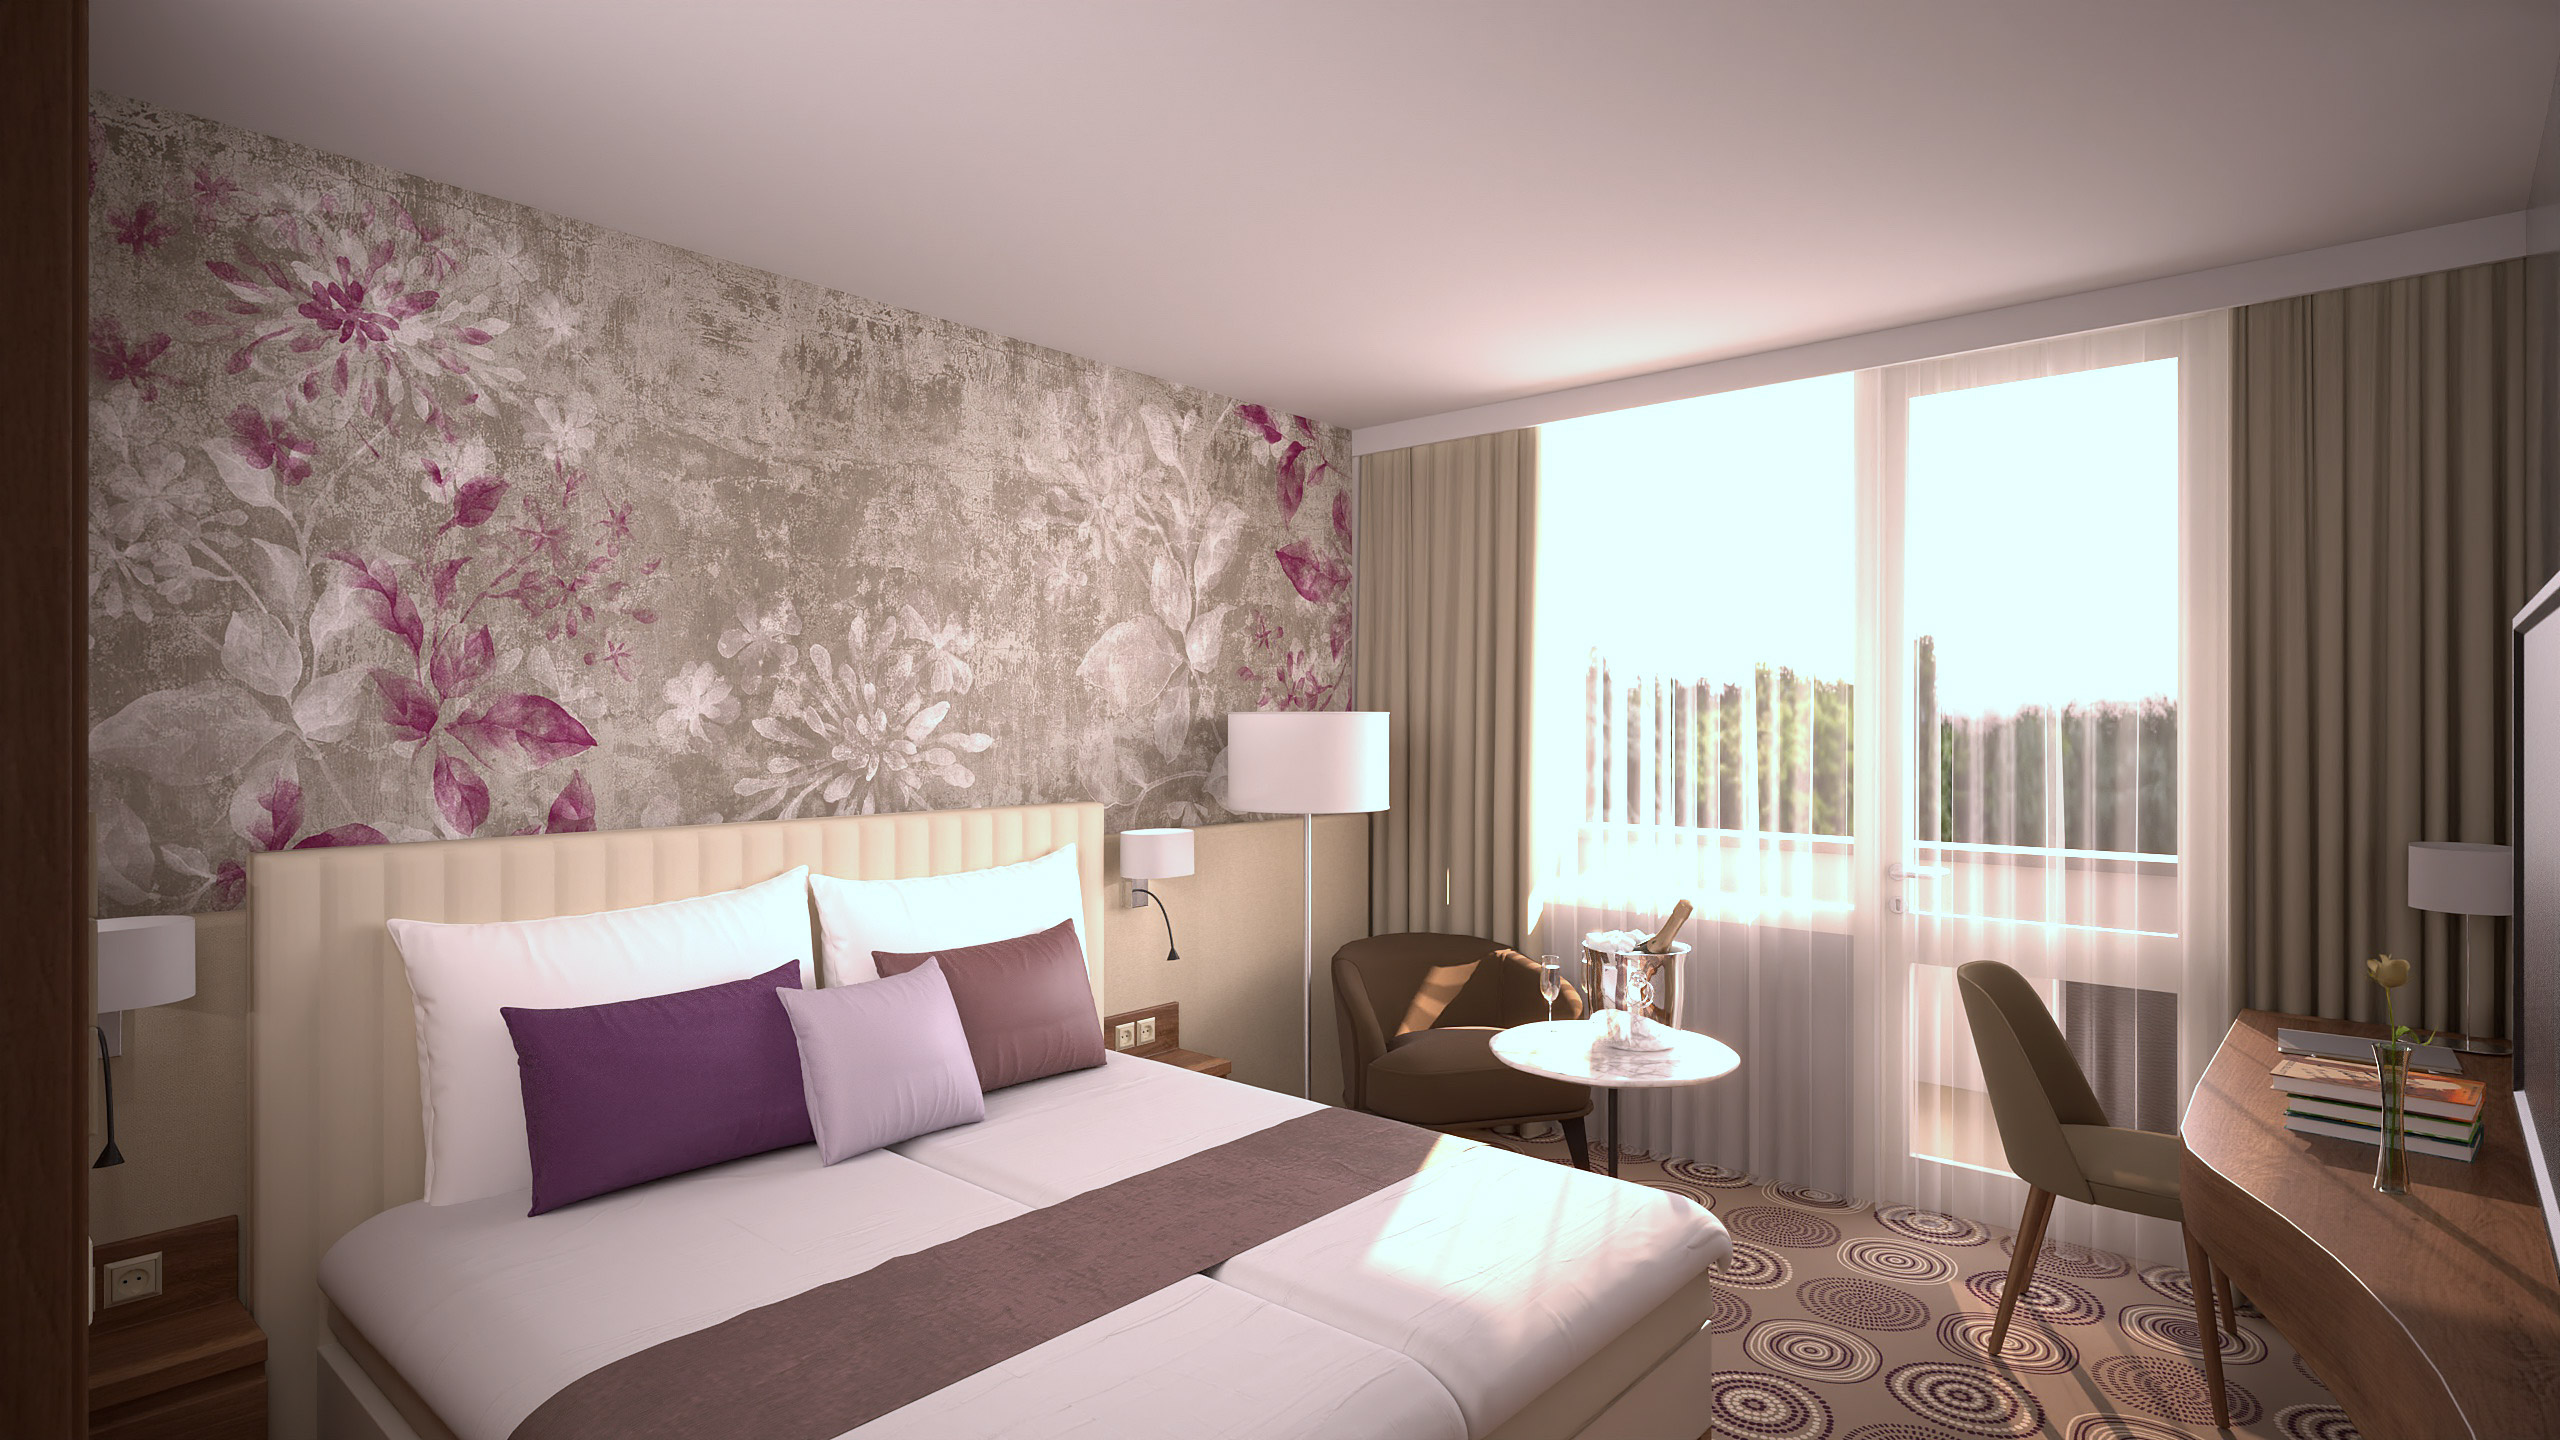 NaturMed Hotel Carbona Deluxe szoba